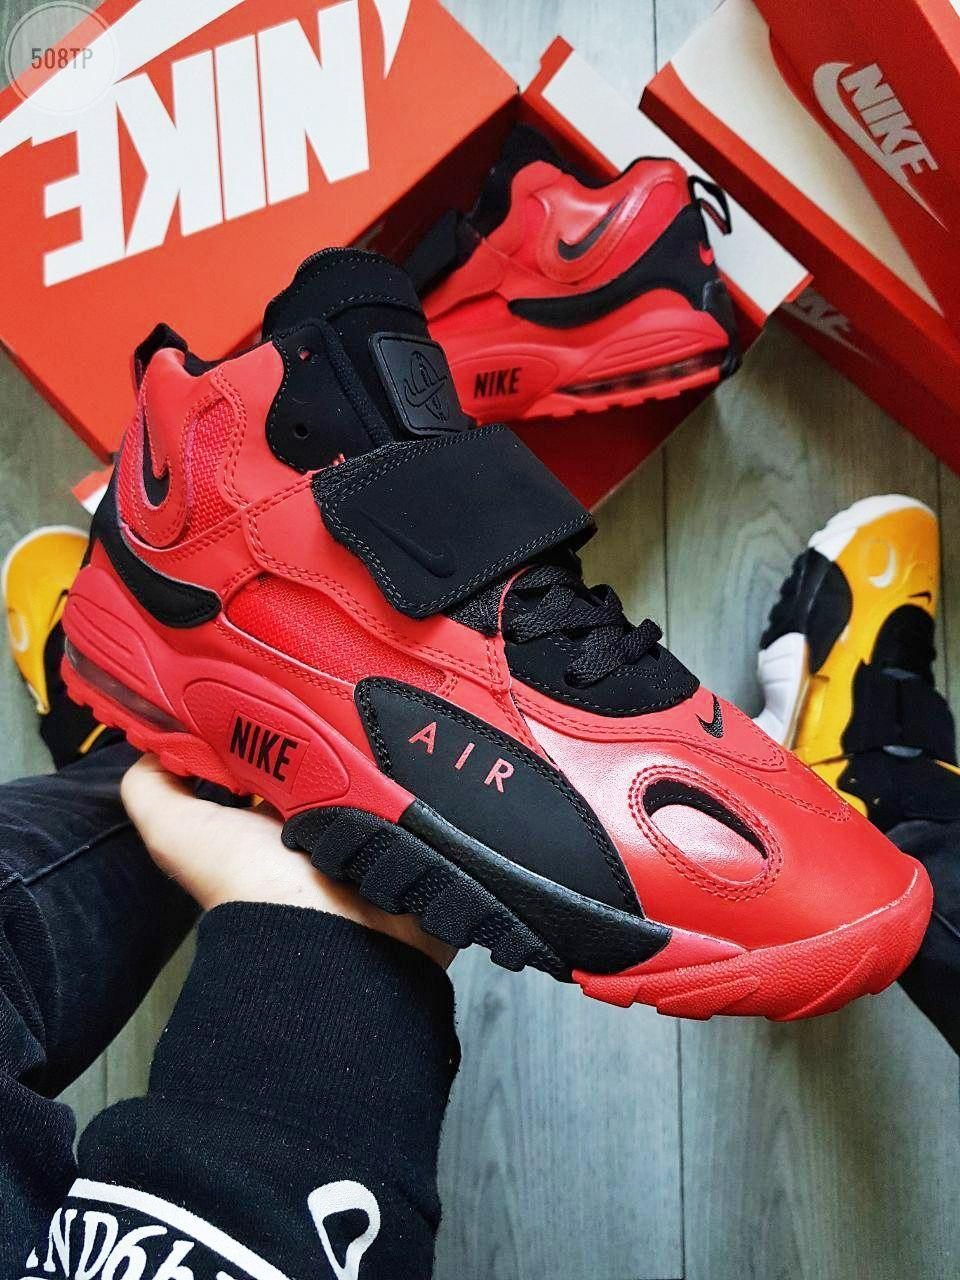 Мужские кроссовки Nike Speed Turf University Red/black